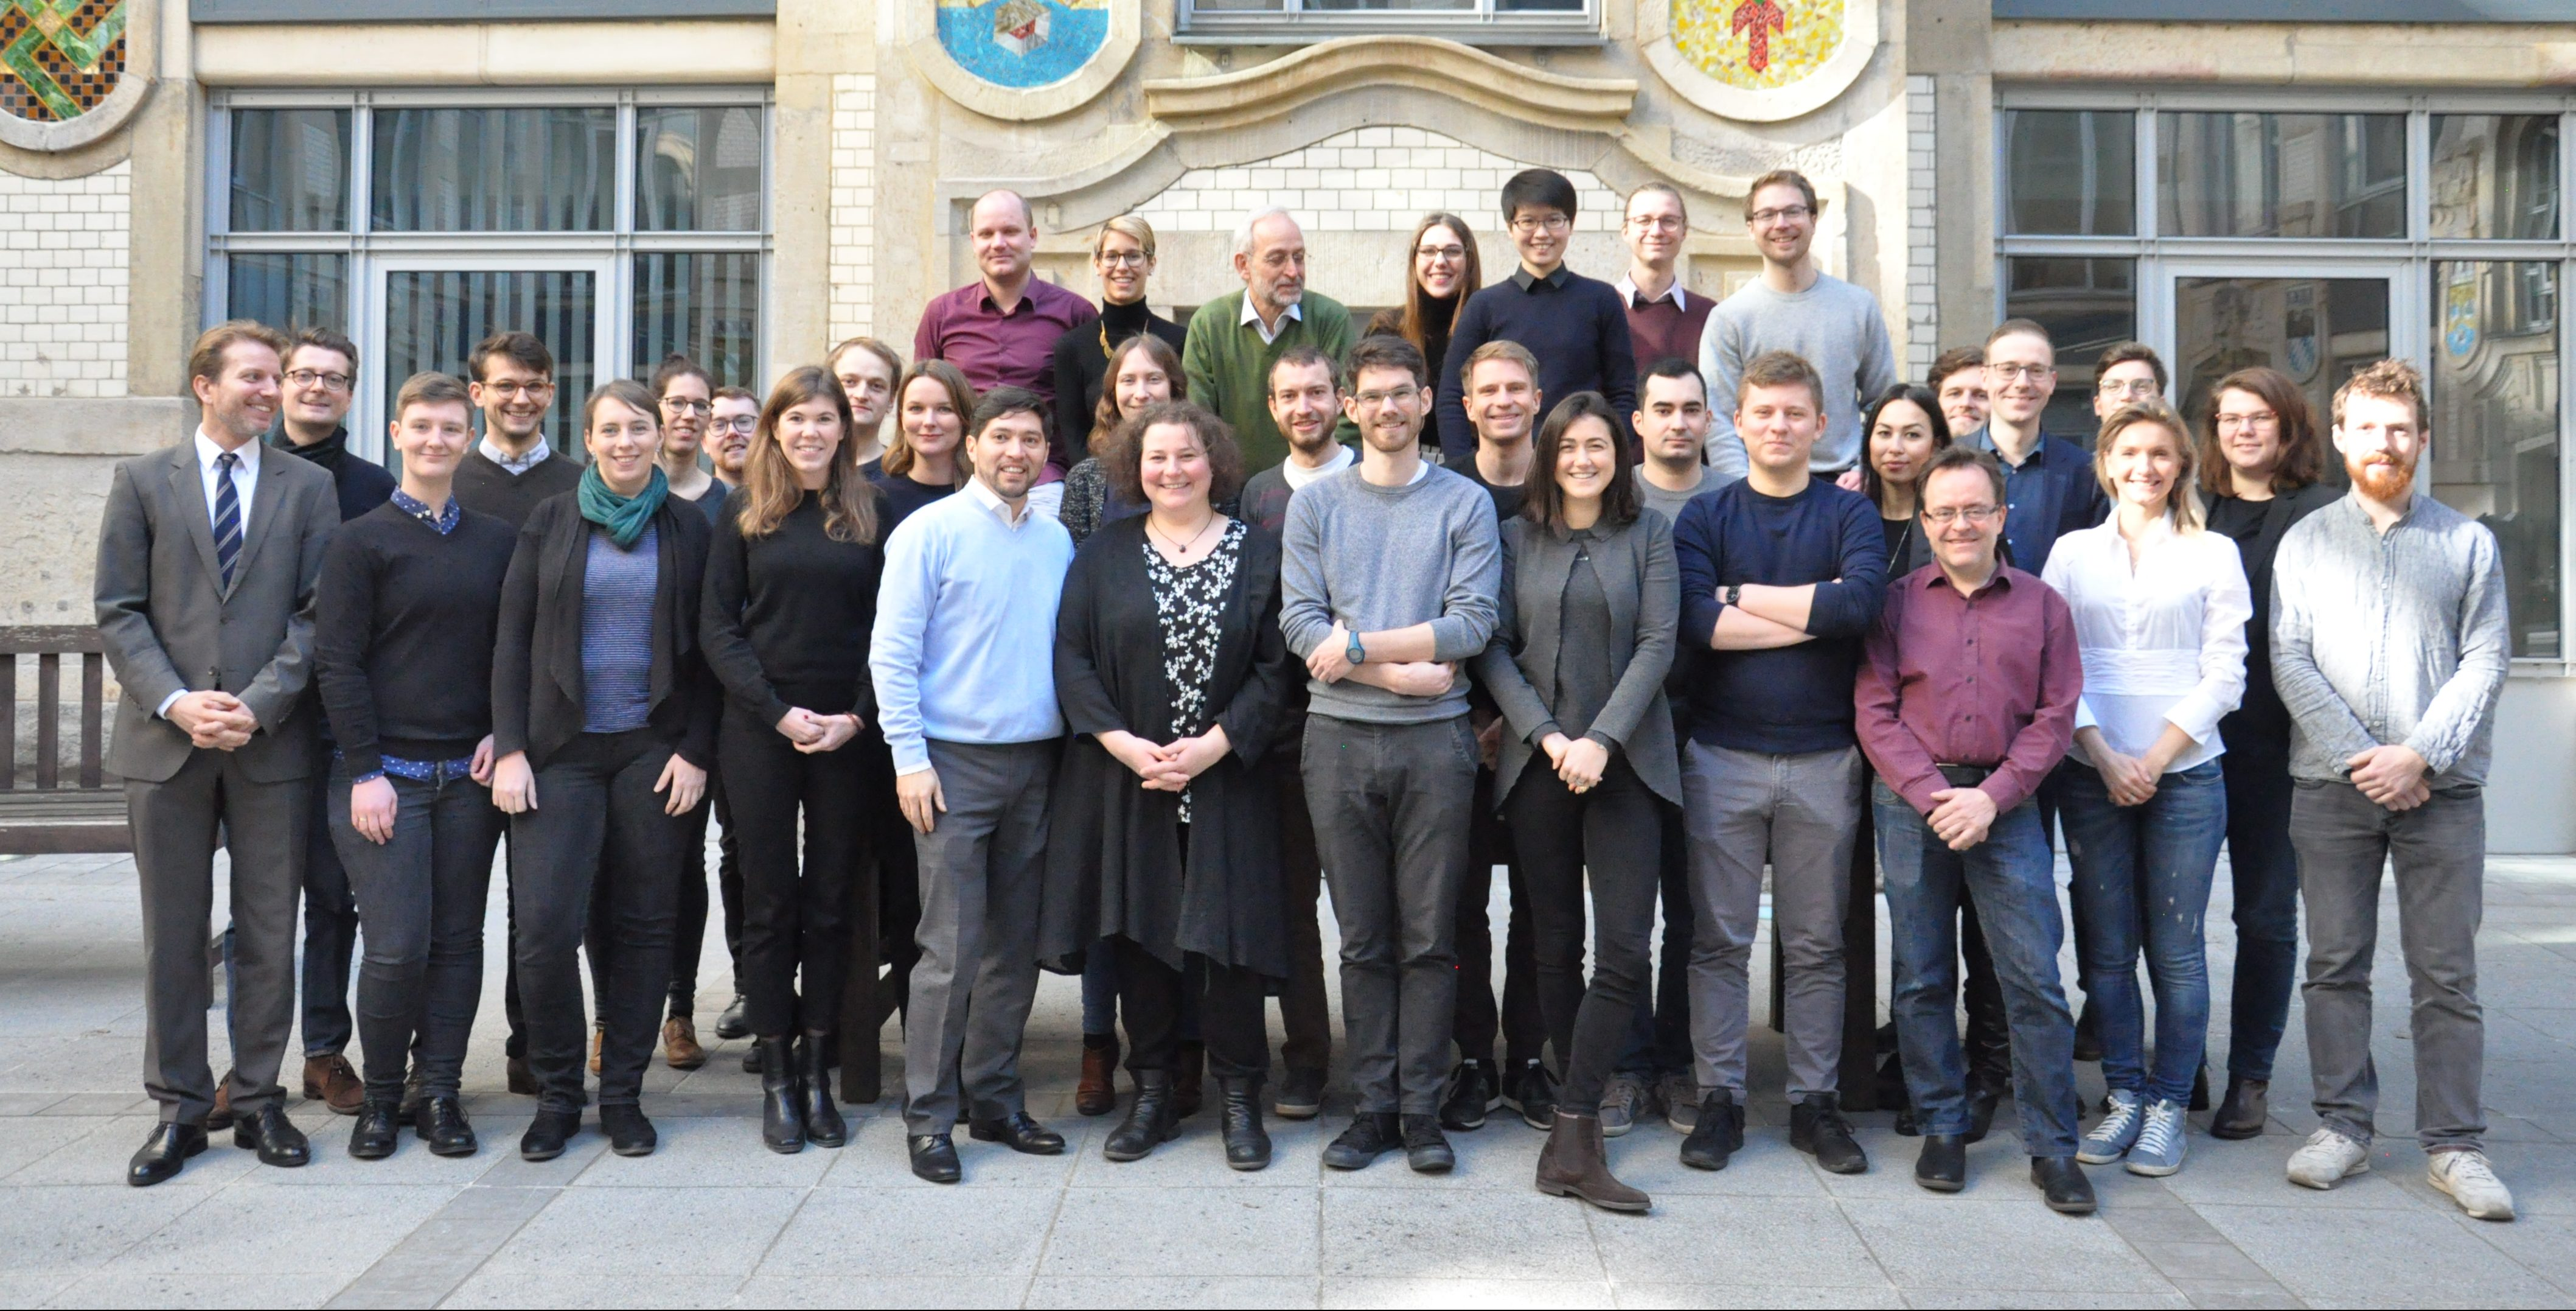 Teile des IKEM-Teams am Standort Berlin im Februar 2019 (Bild: IKEM)